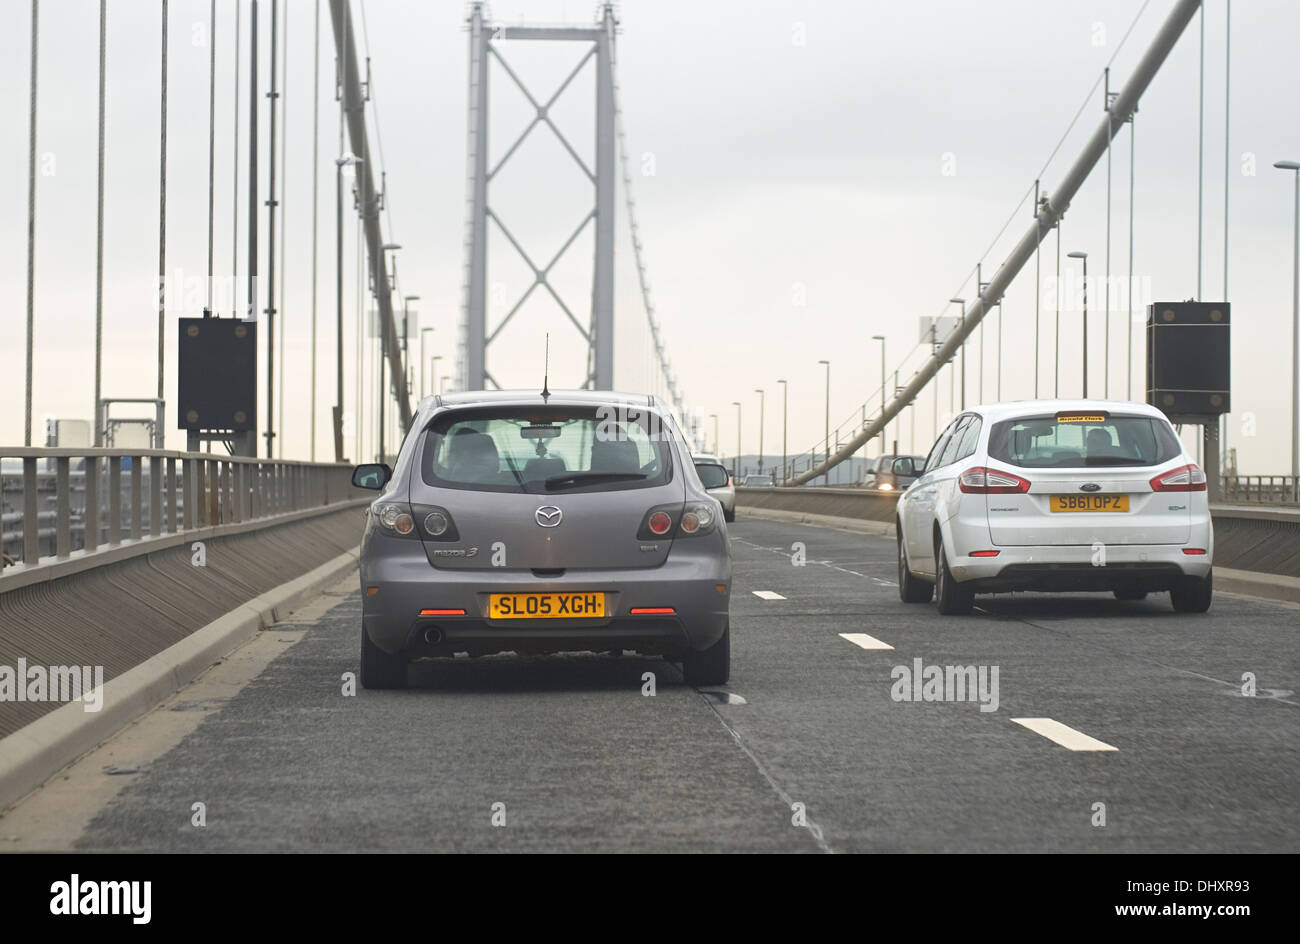 Cars crossing the Forth Road Bridge near Glasgow, Scotland,UK. - Stock Image